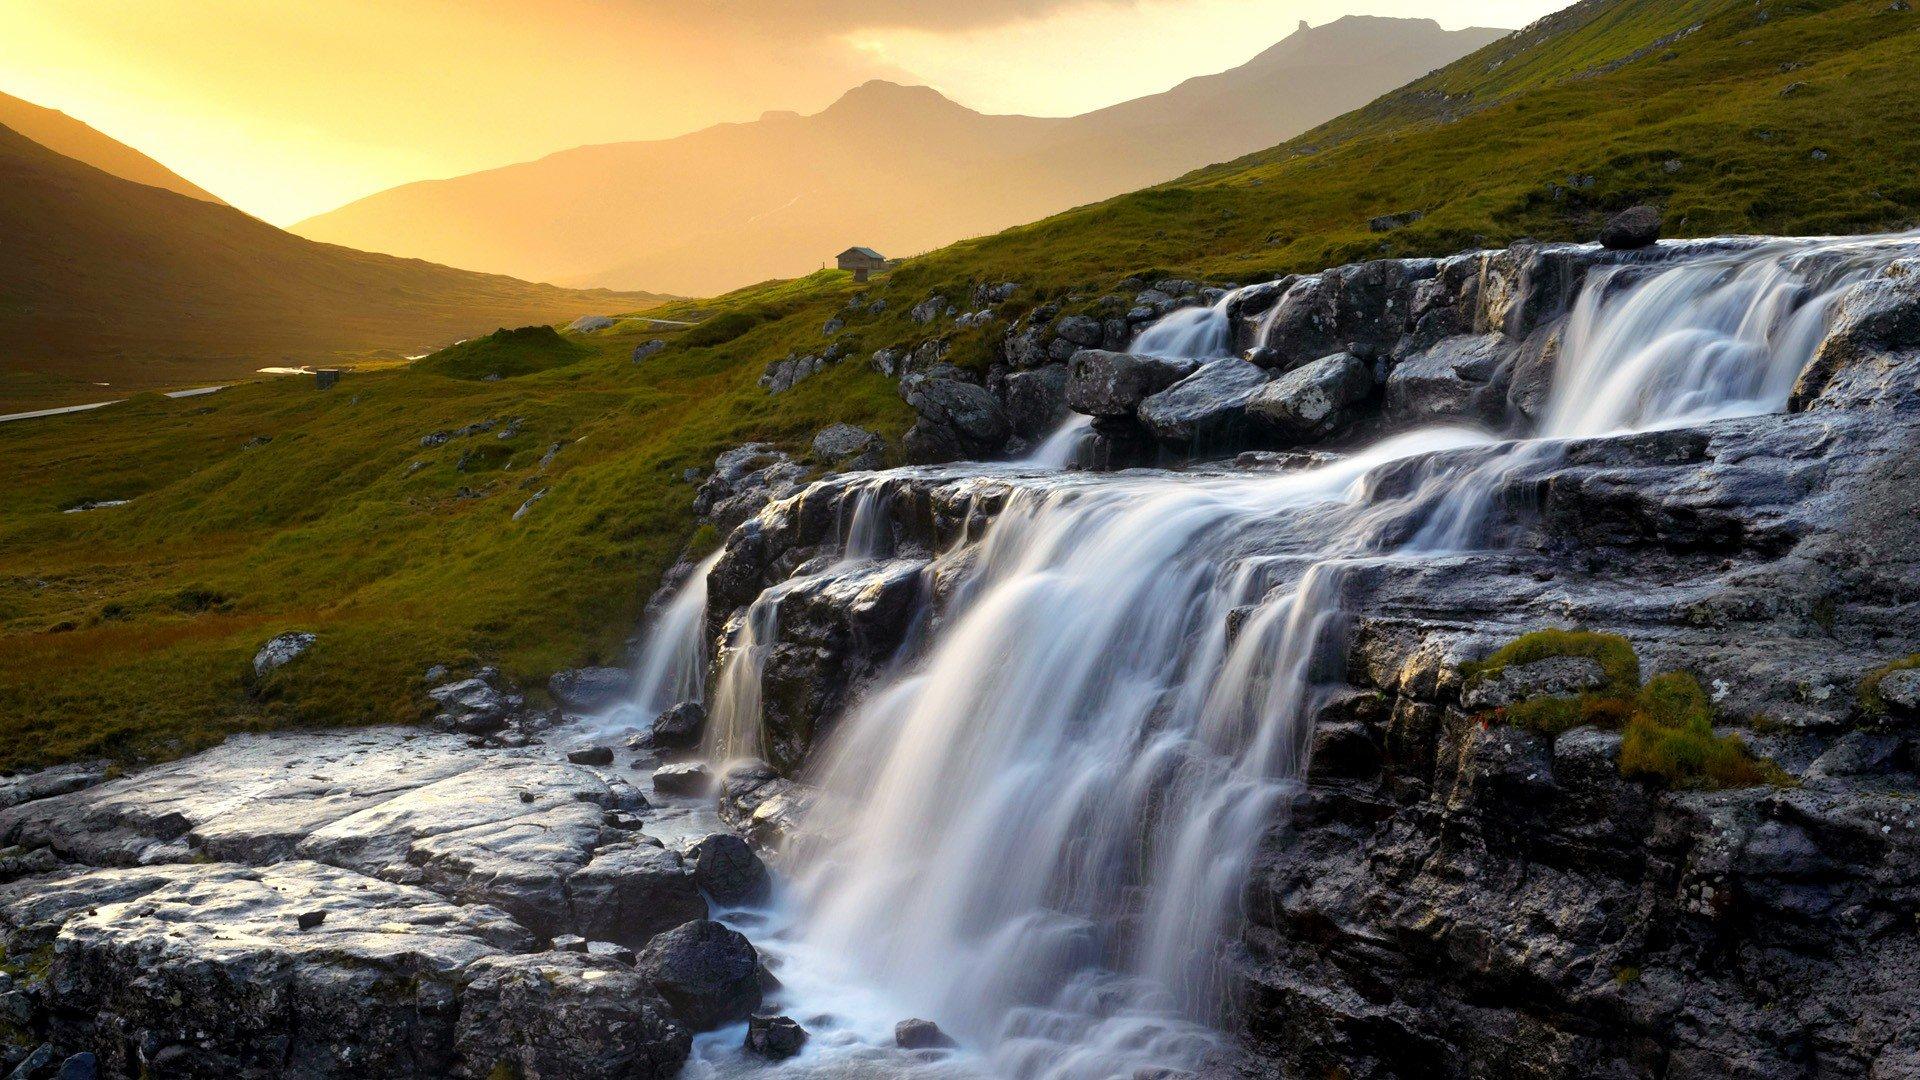 Free Download Waterfall Wallpaper ID107011 Hd 1920x1080 For Desktop